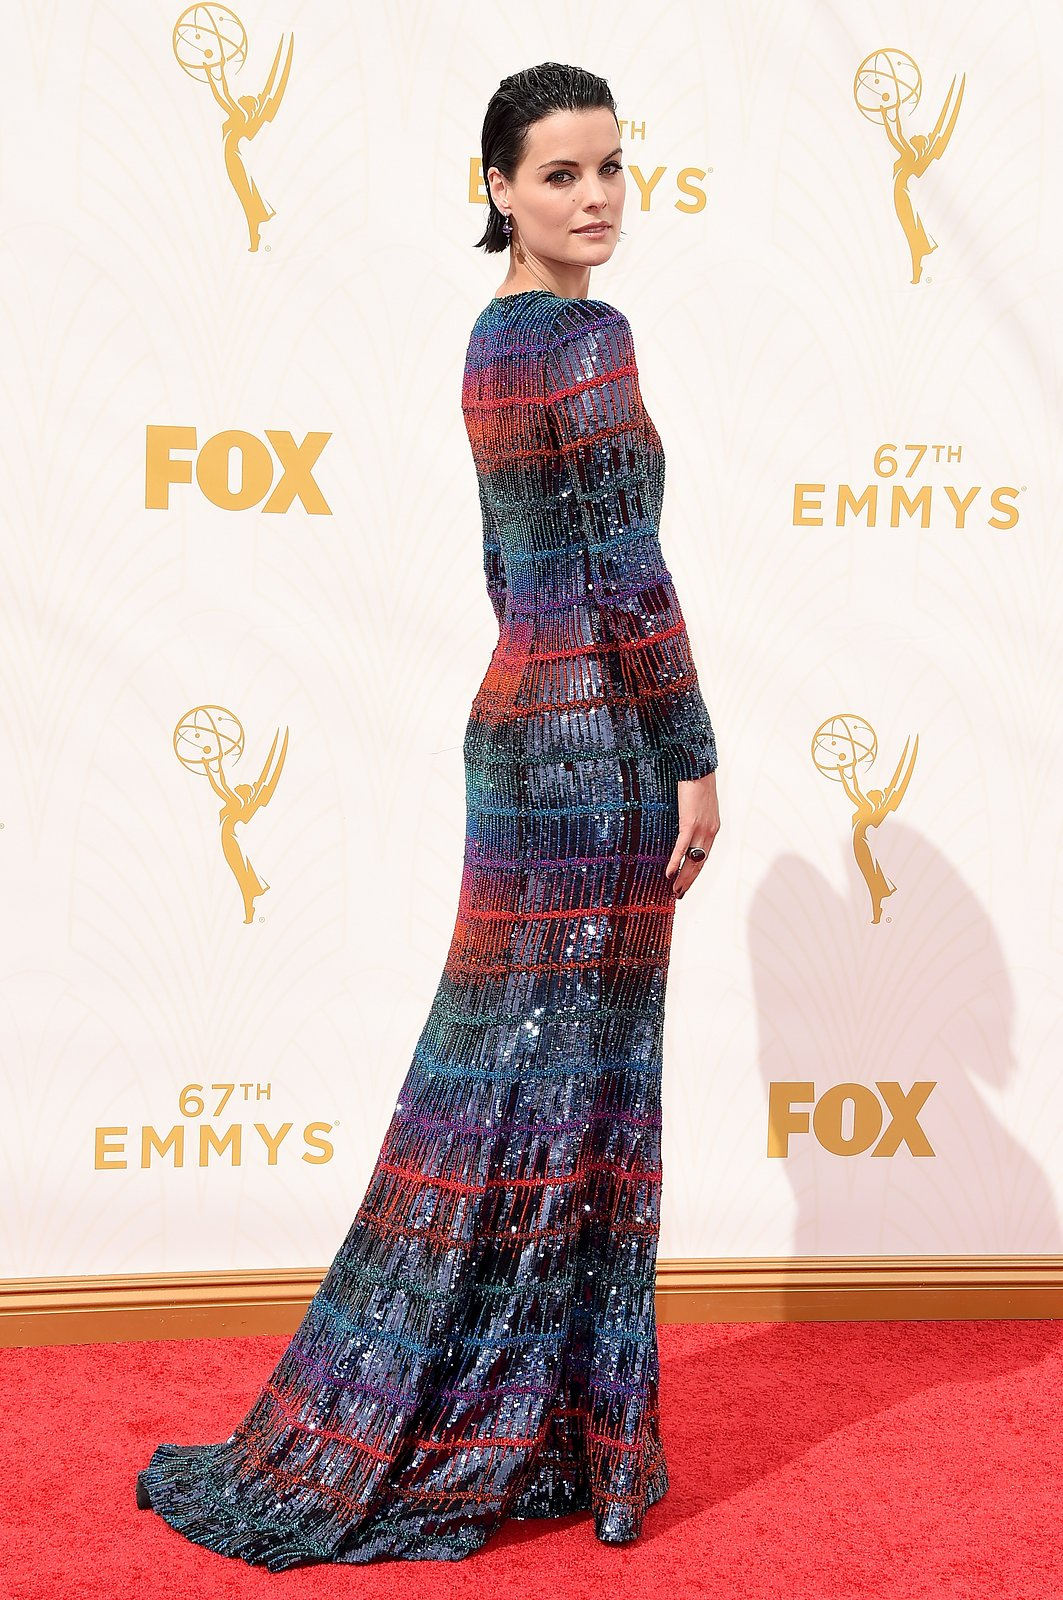 jamie-alexander-emmys-red-carpet-2015.jpg